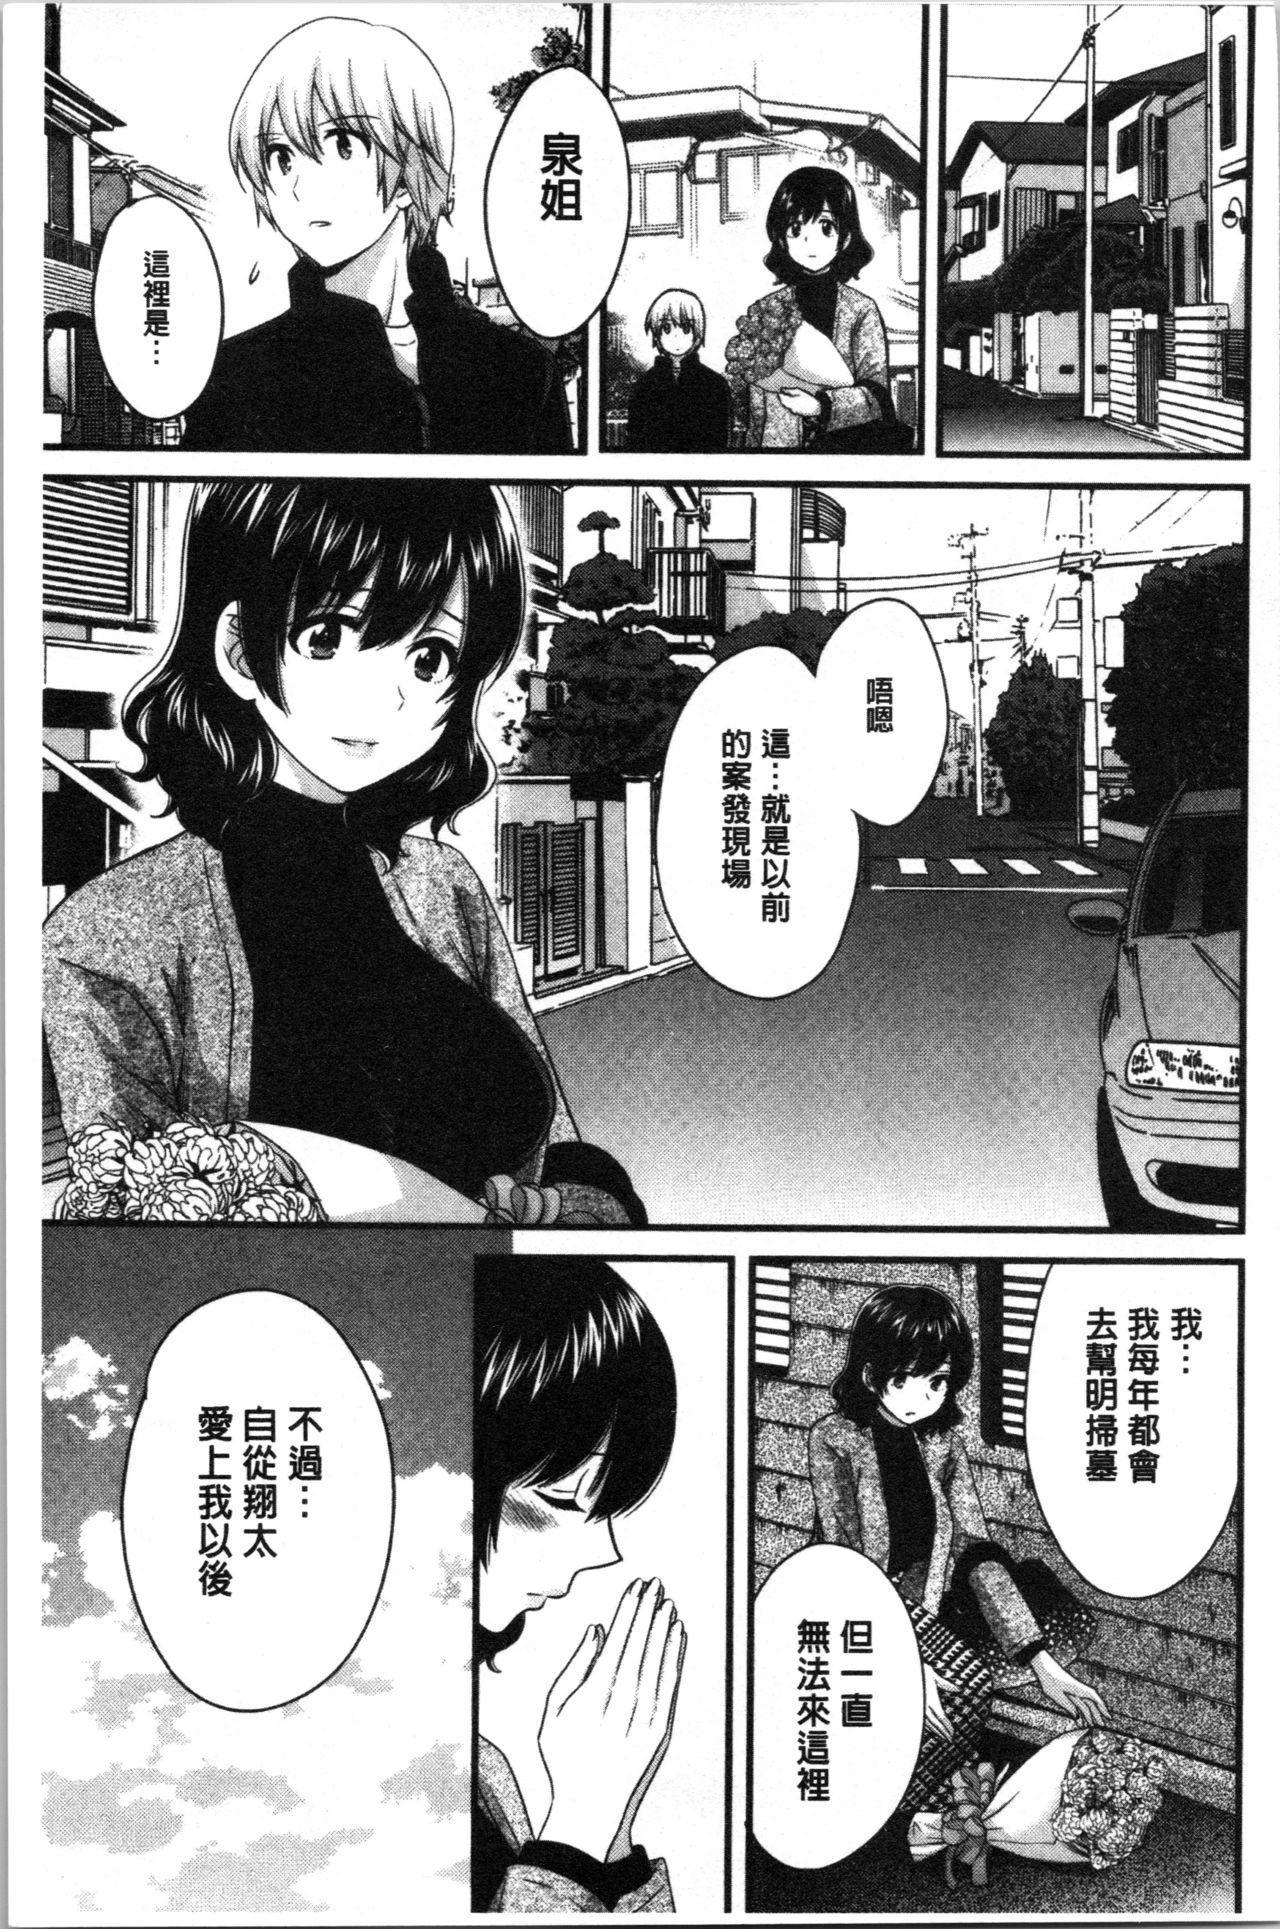 Ottori Midarana Mikami-san   嫻淑優雅又淫亂的三上小姐 186